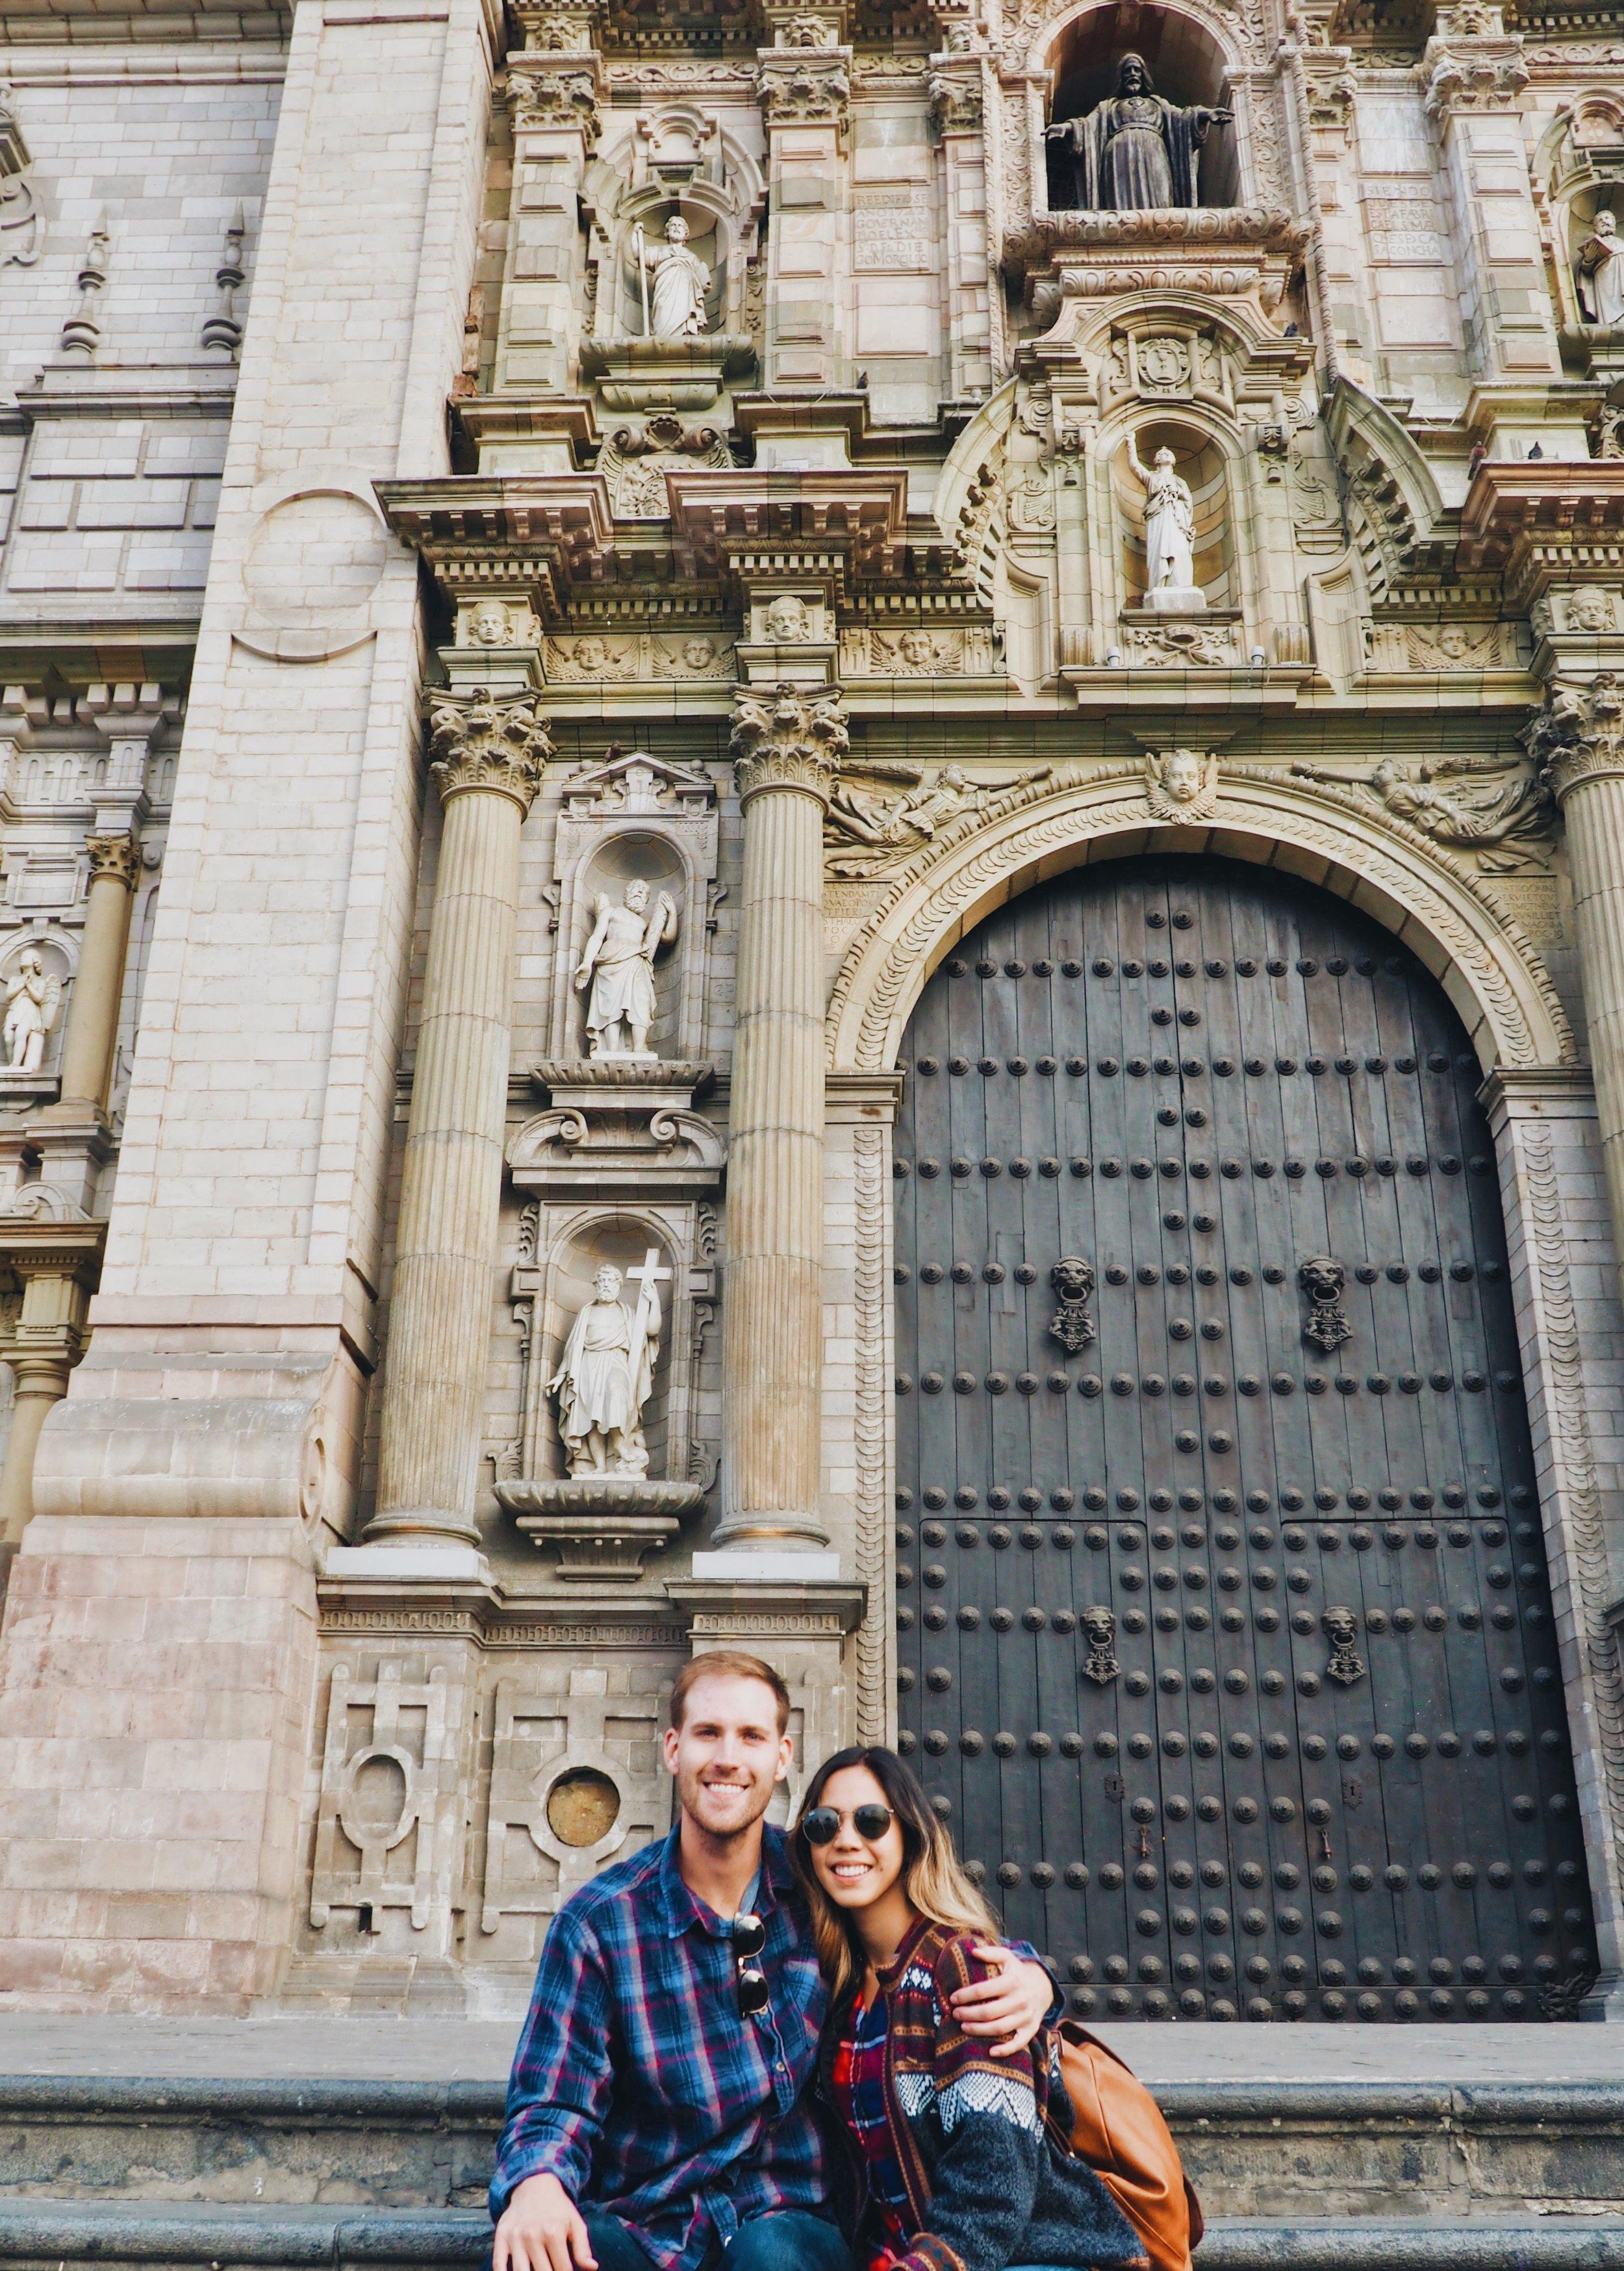 Basilica Cathedral, Plaza de Armas of Lima, Peru